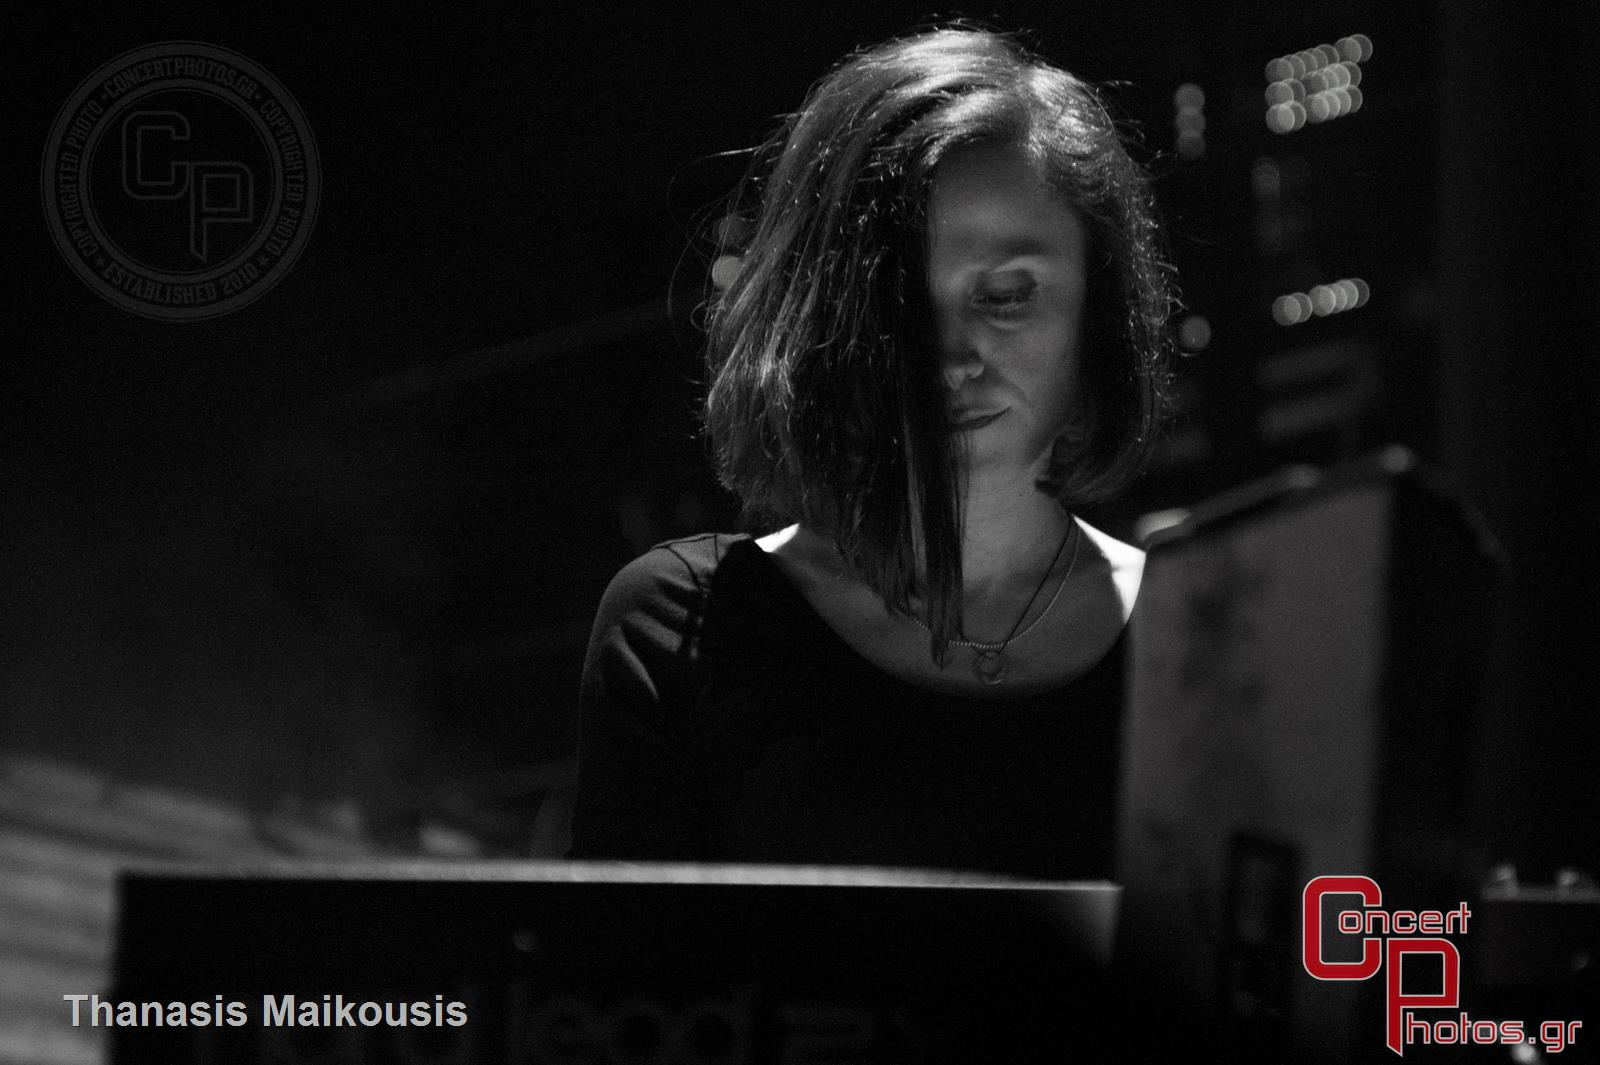 Tricky - Spectralfire-Tricky - Spectralfire photographer: Thanasis Maikousis - concertphotos_-3468